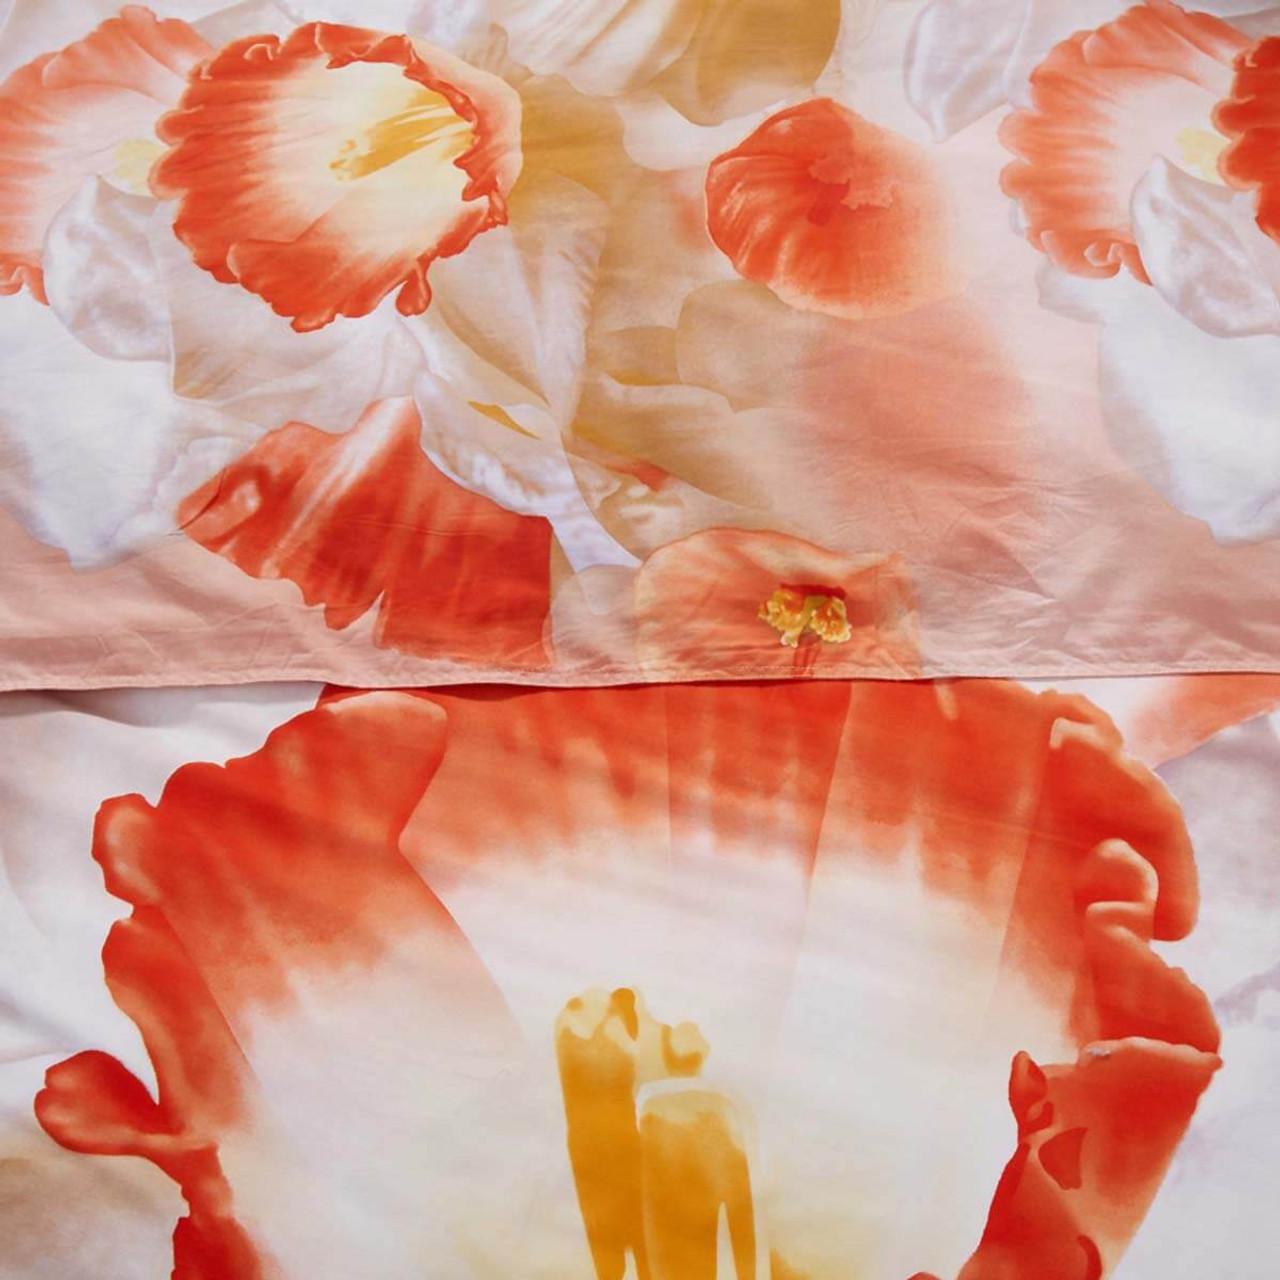 Duvet Cover Set, Queen size Floral Bedding, Dolce Mela - April DM702Q